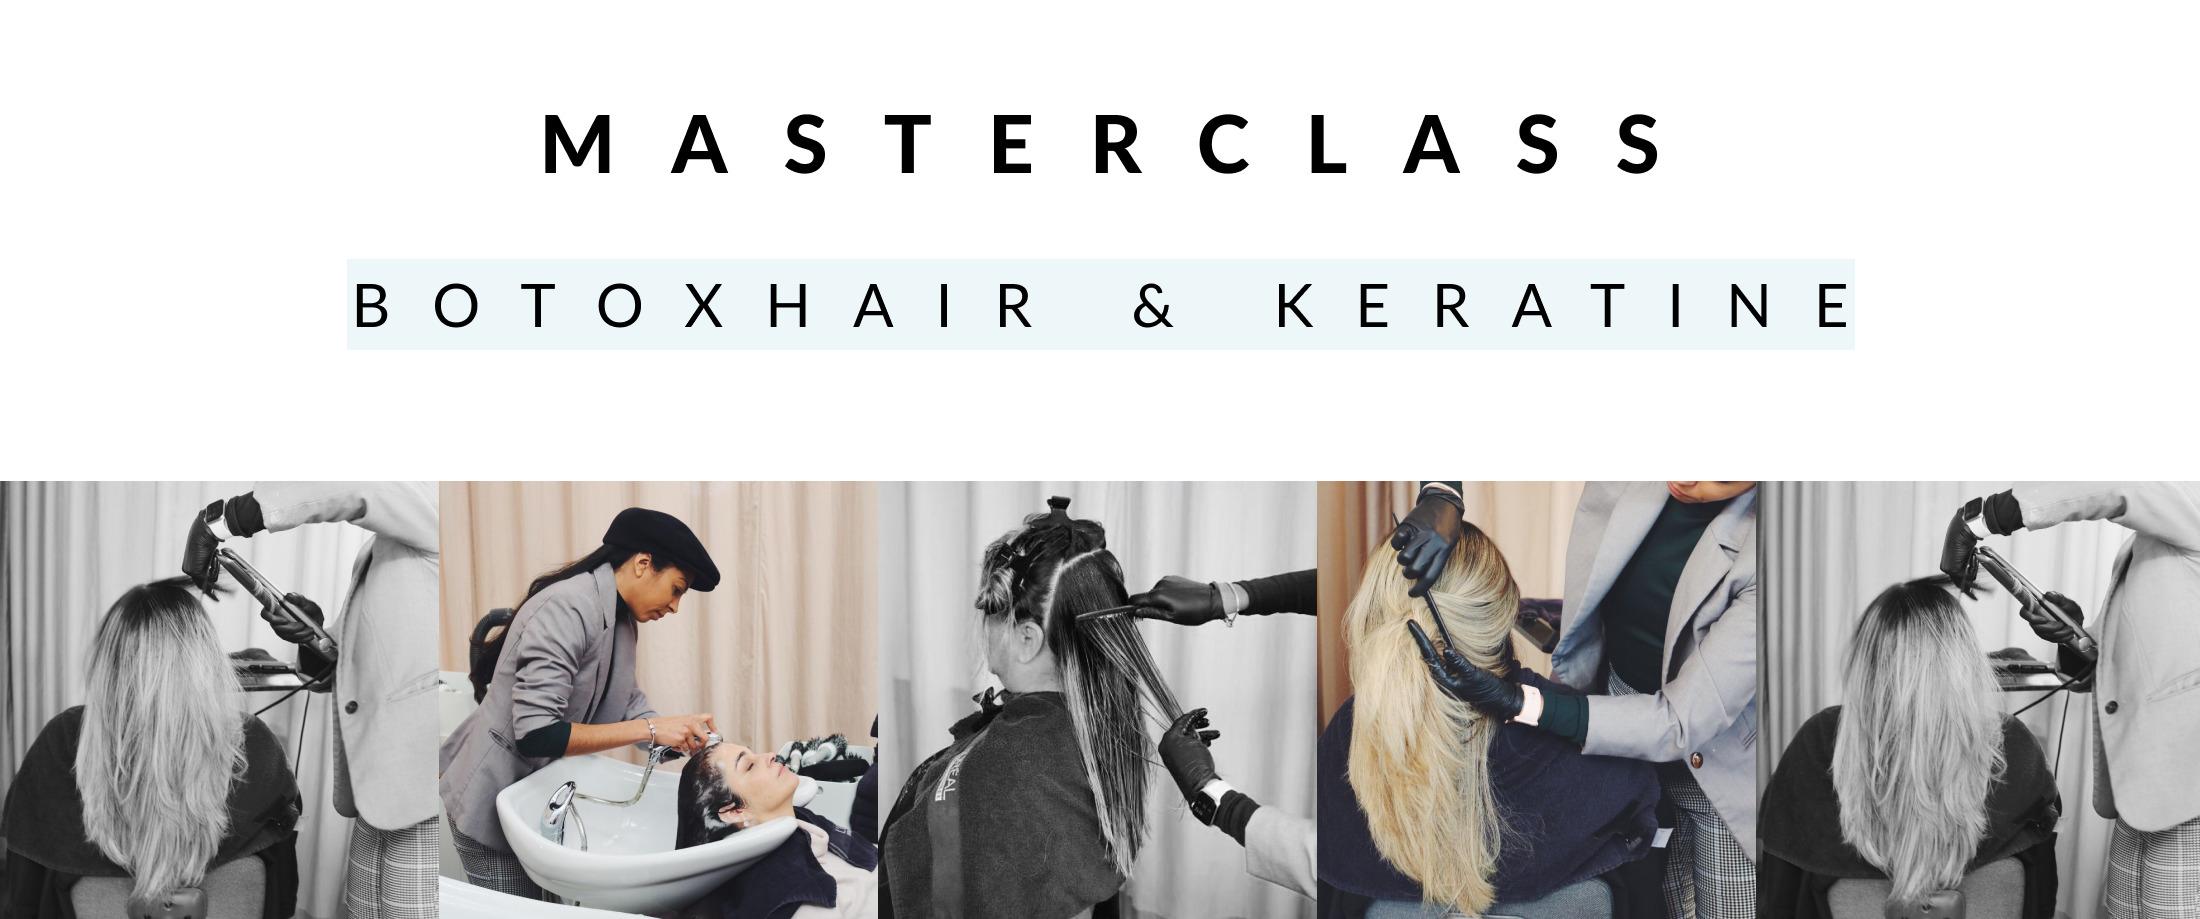 masterclass botoxhair & keratine 1